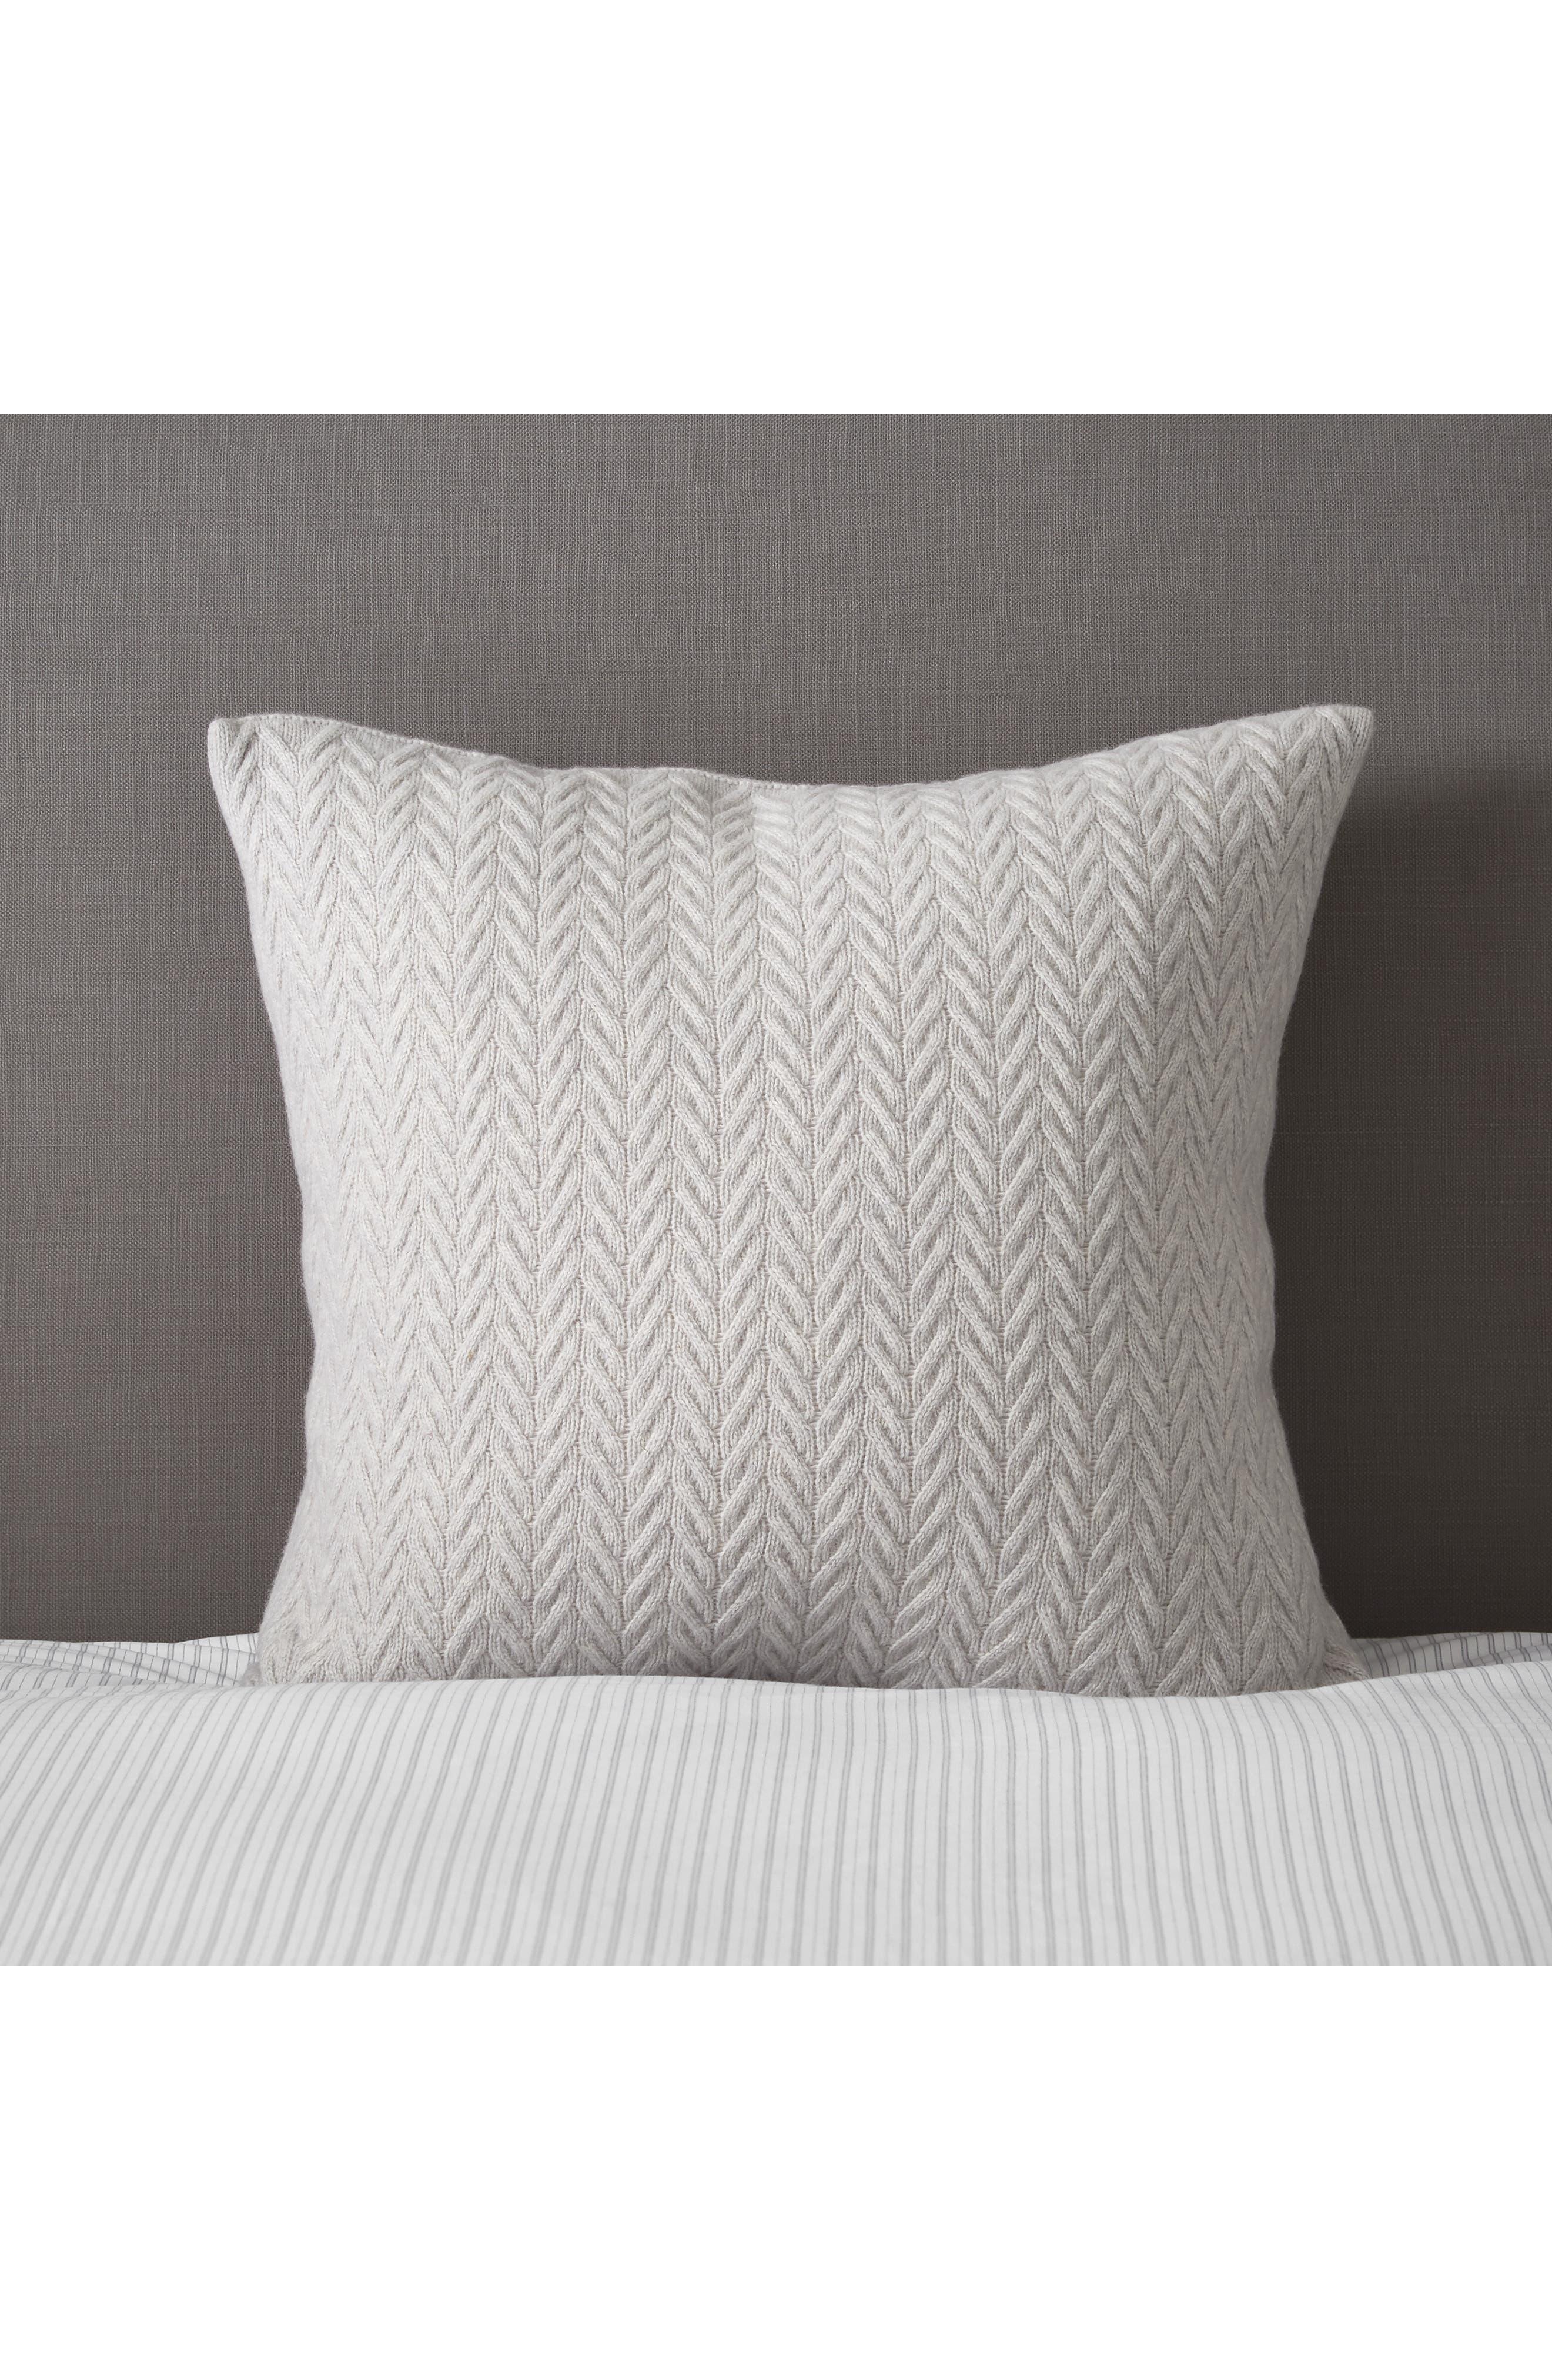 THE WHITE COMPANY, Fairfax Cushion Cover, Main thumbnail 1, color, 020